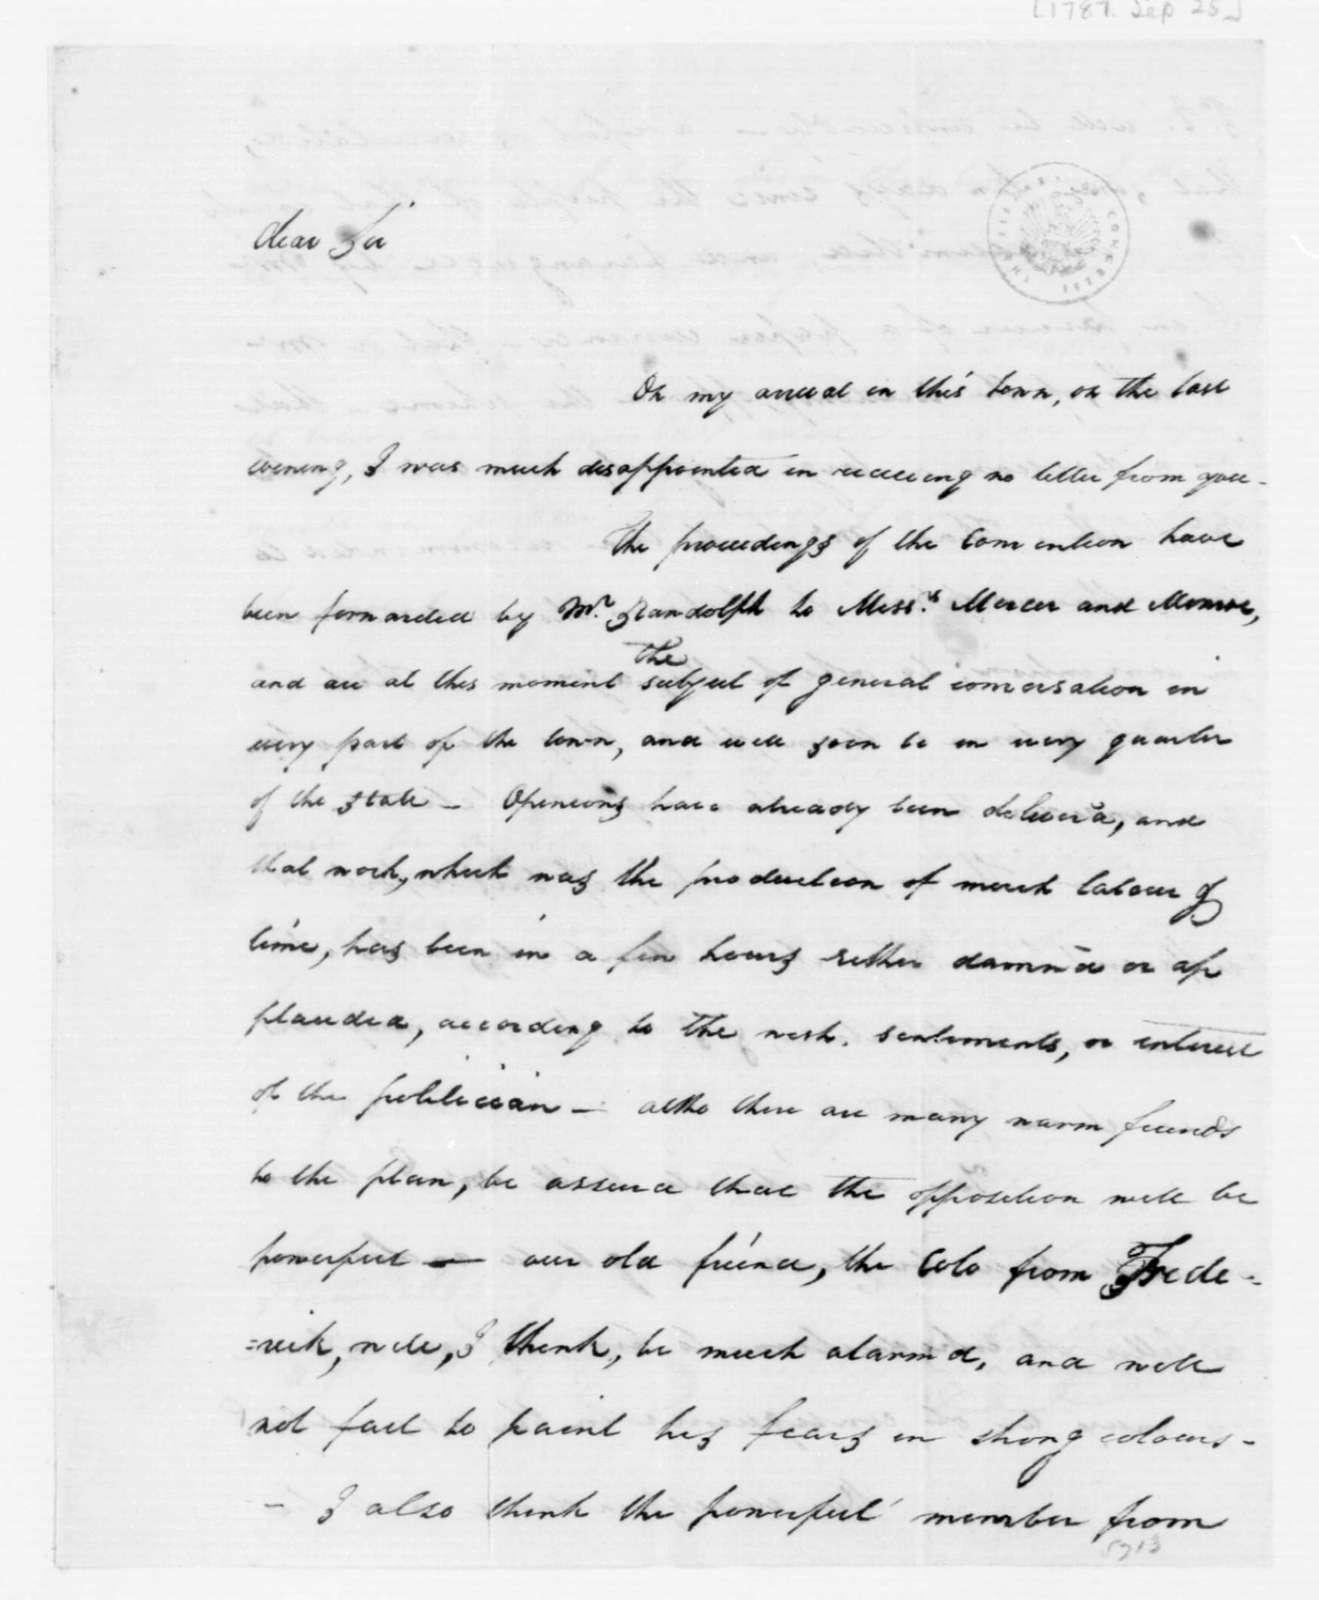 John Dawson to James Madison, September 25, 1787.